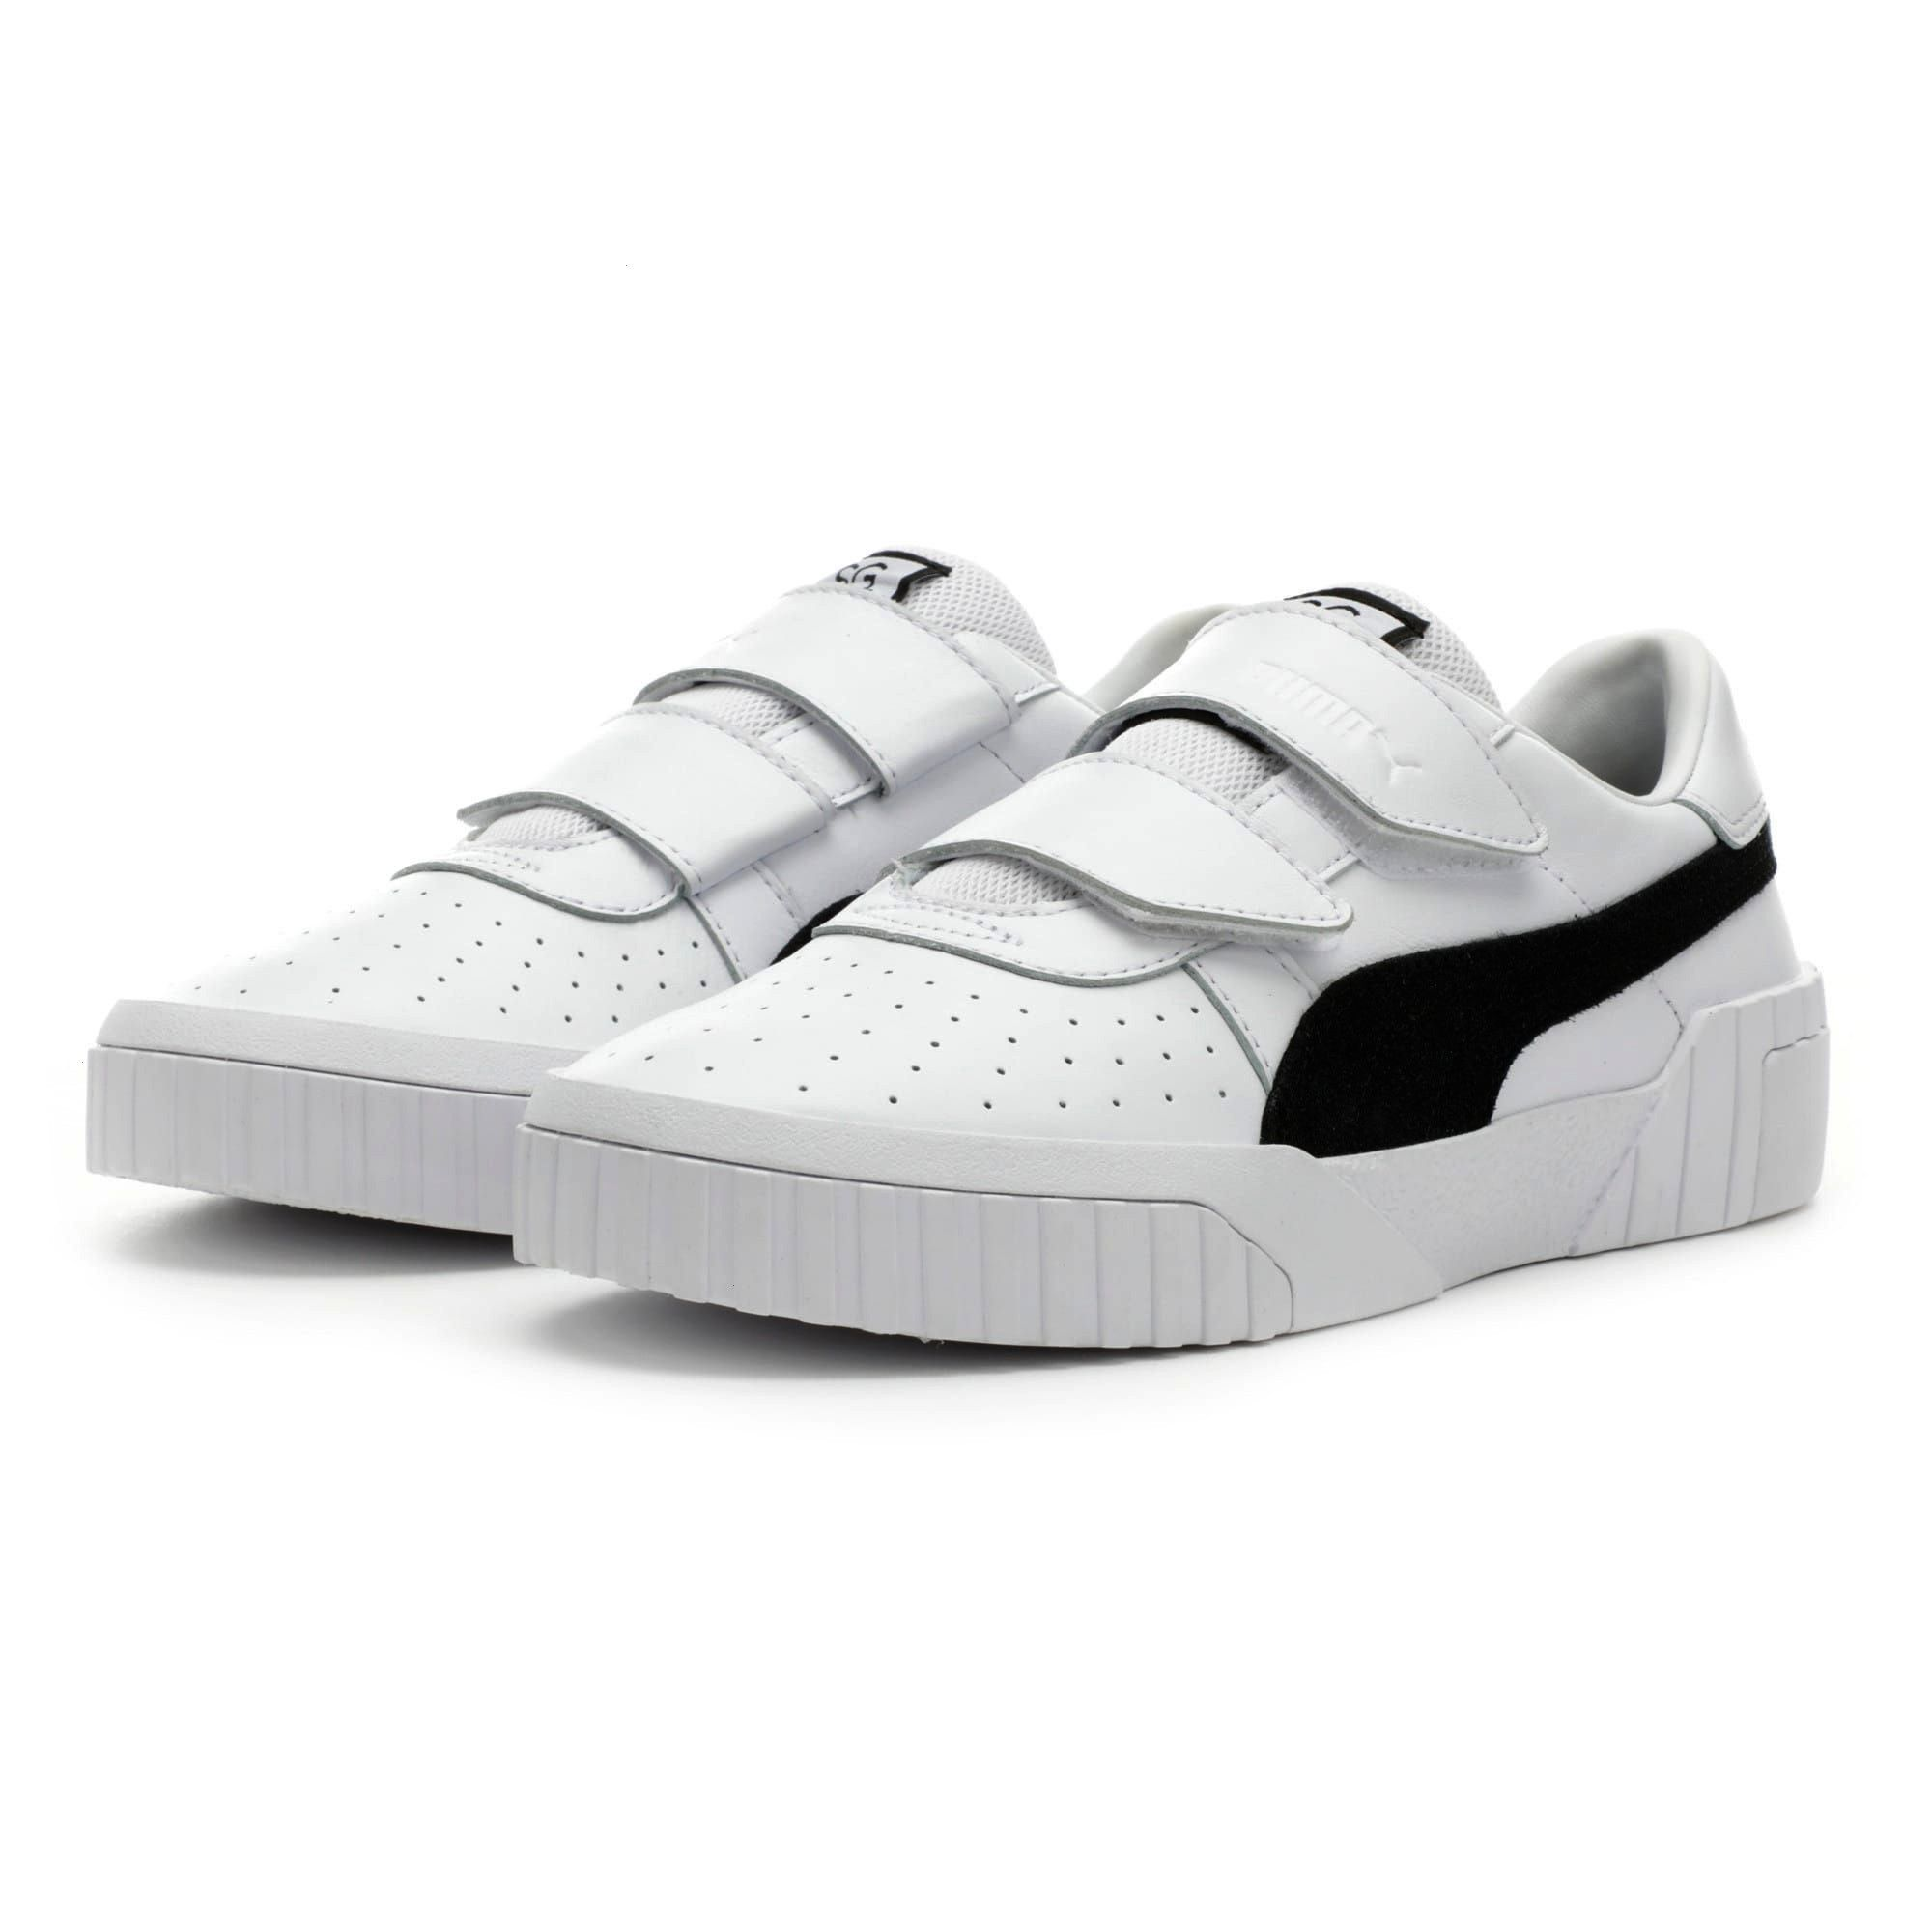 Review : Nike Air Max 270 toute blanche 'Triple White'